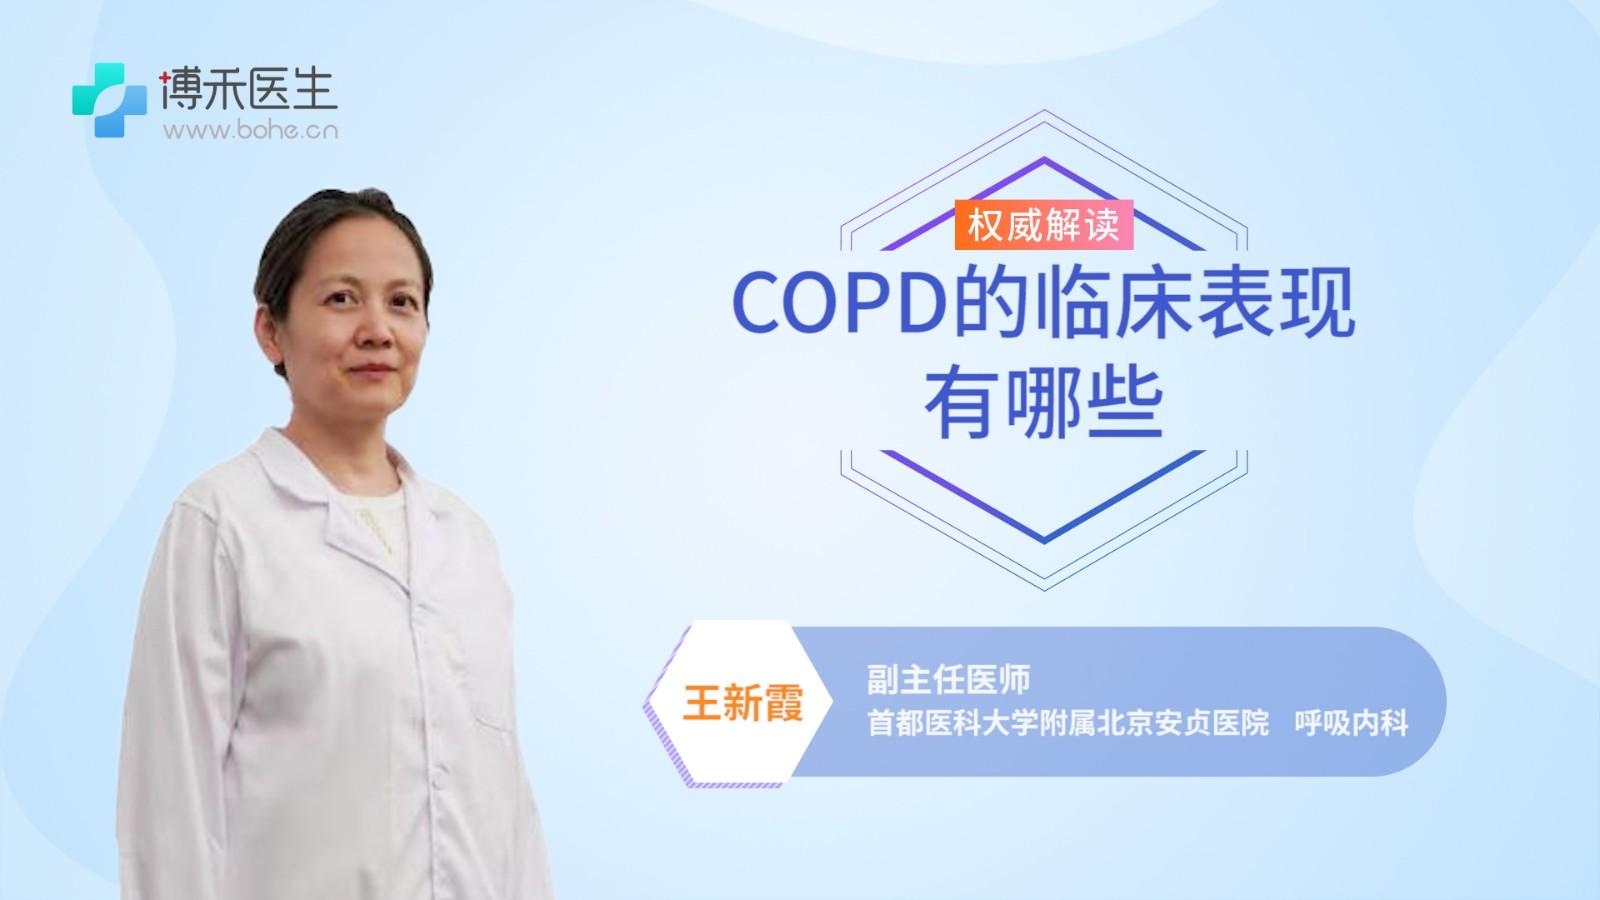 COPD的臨床表現有哪些